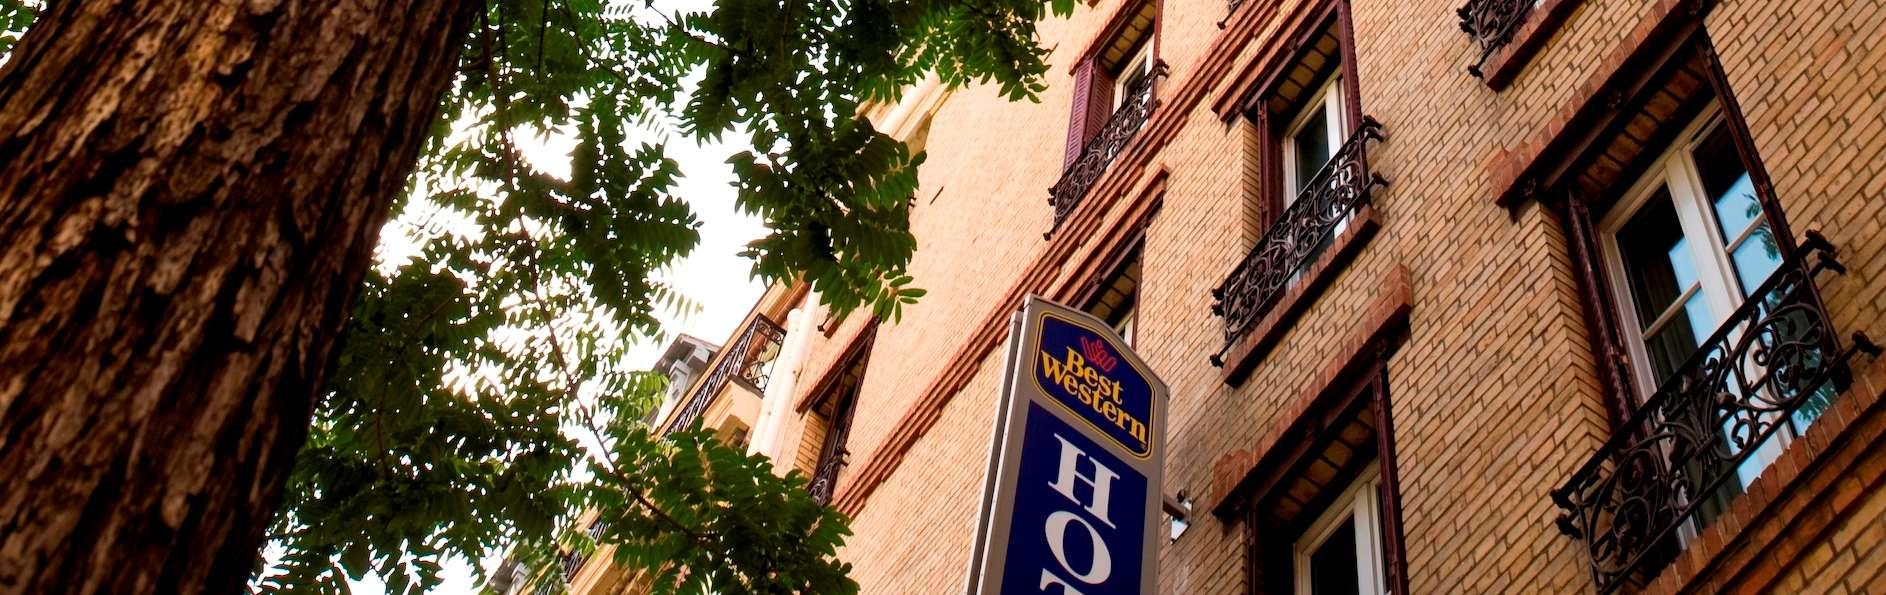 Best Western Hôtel Montcalm - Façade